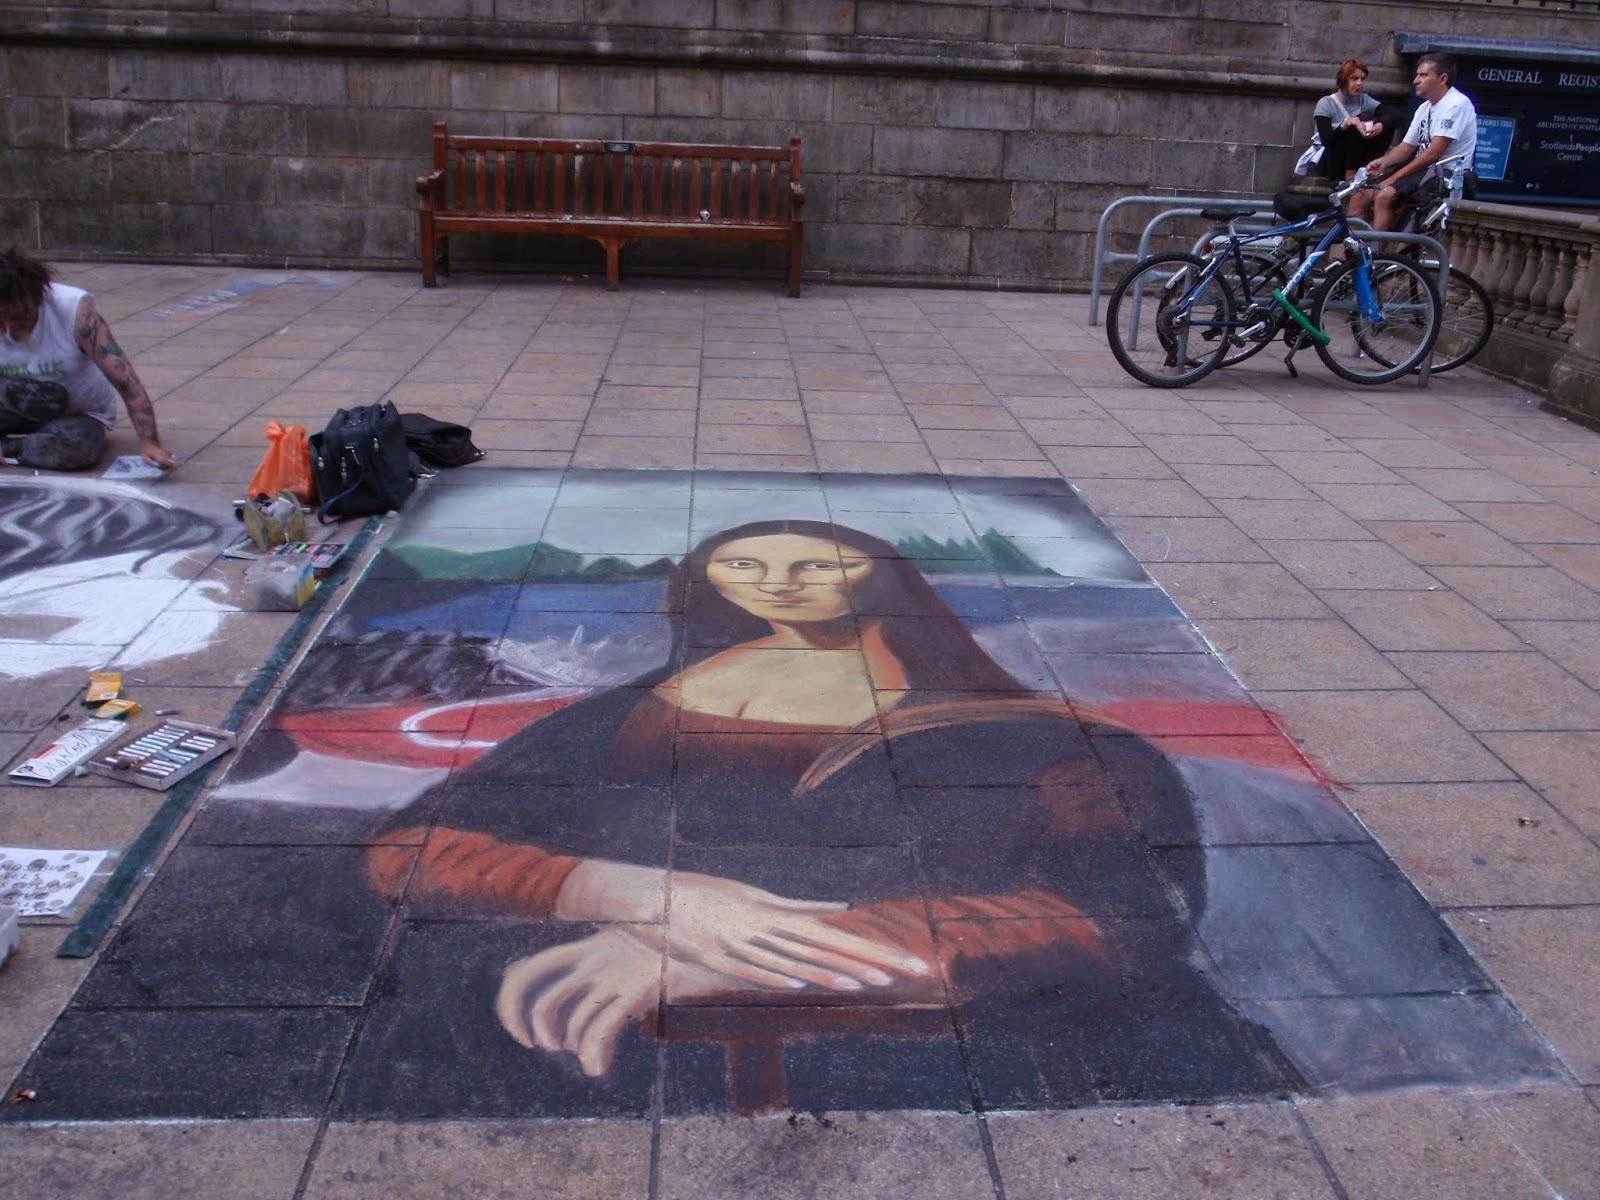 Chalk art of the Mona Lisa